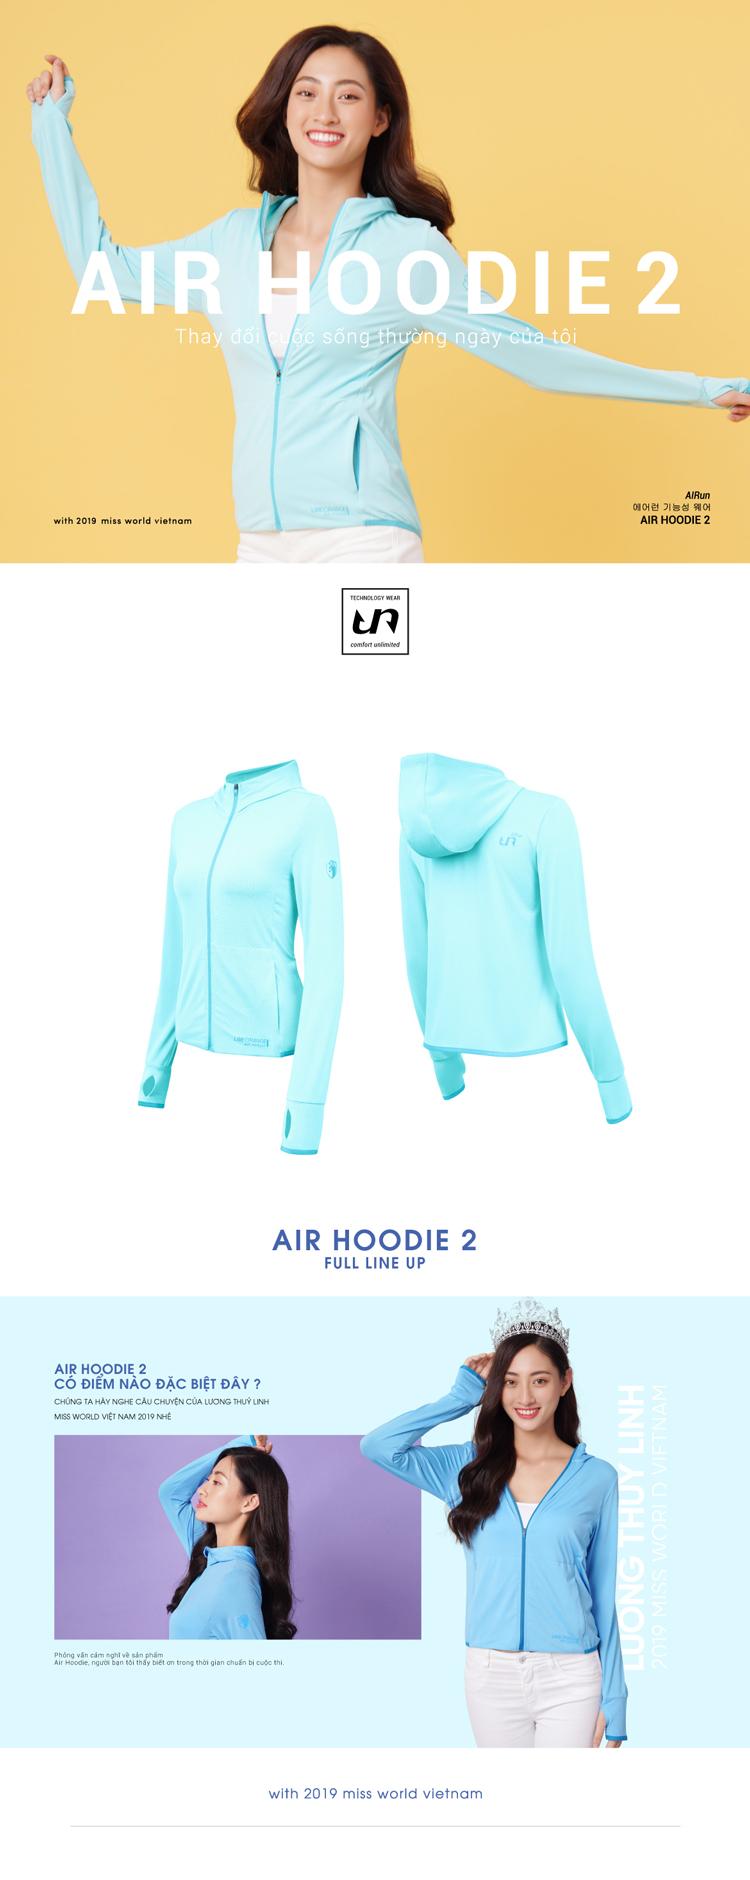 Áo khoác nữ Air Hoodie LO19707101-CY